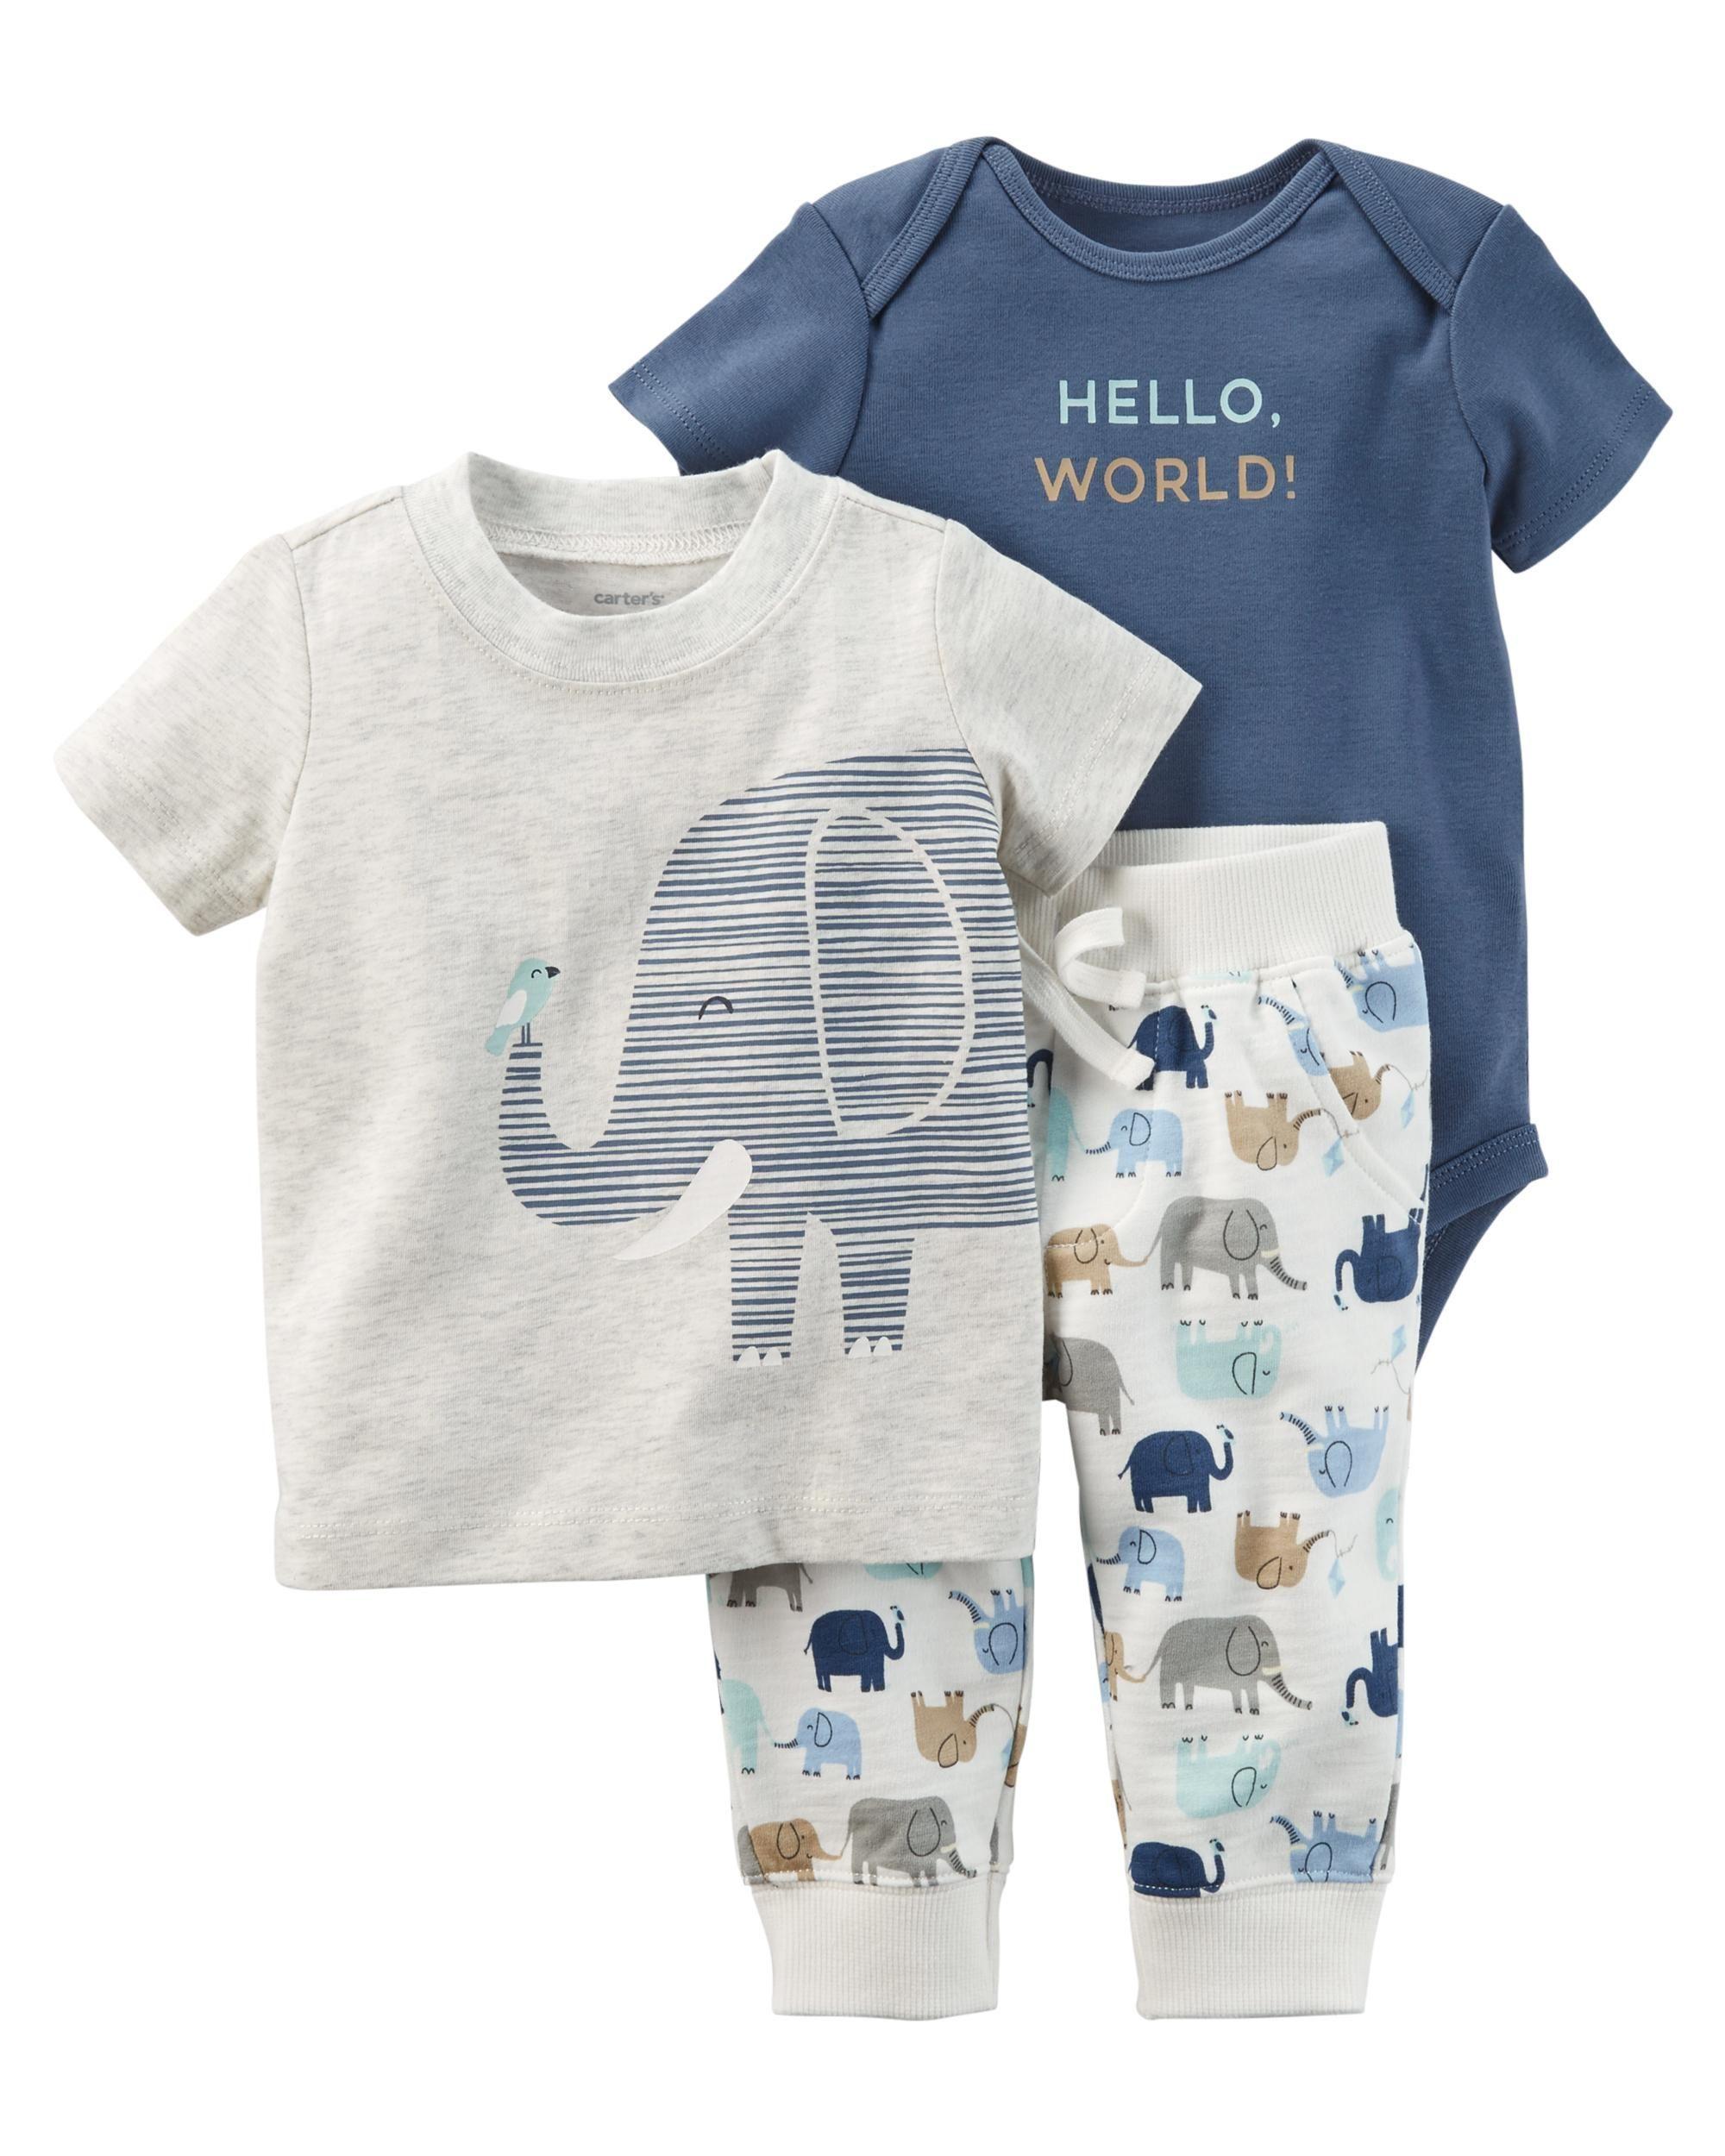 3 Piece Elephant Babysoft Bodysuit Pant Set